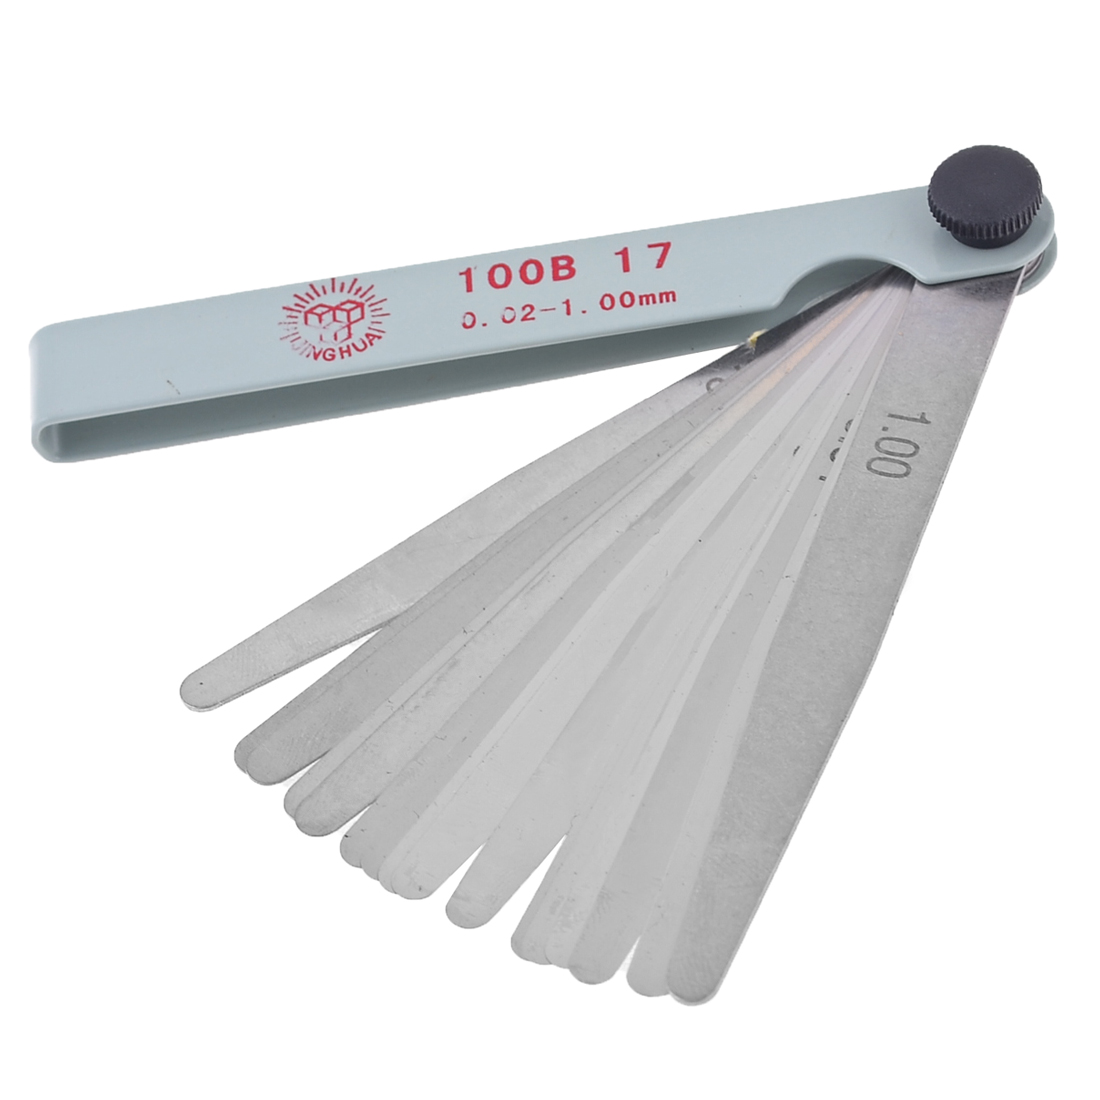 10.5cm 0.02-1.0mm Metric Gap Measure Feeler Gauge Measure Tools